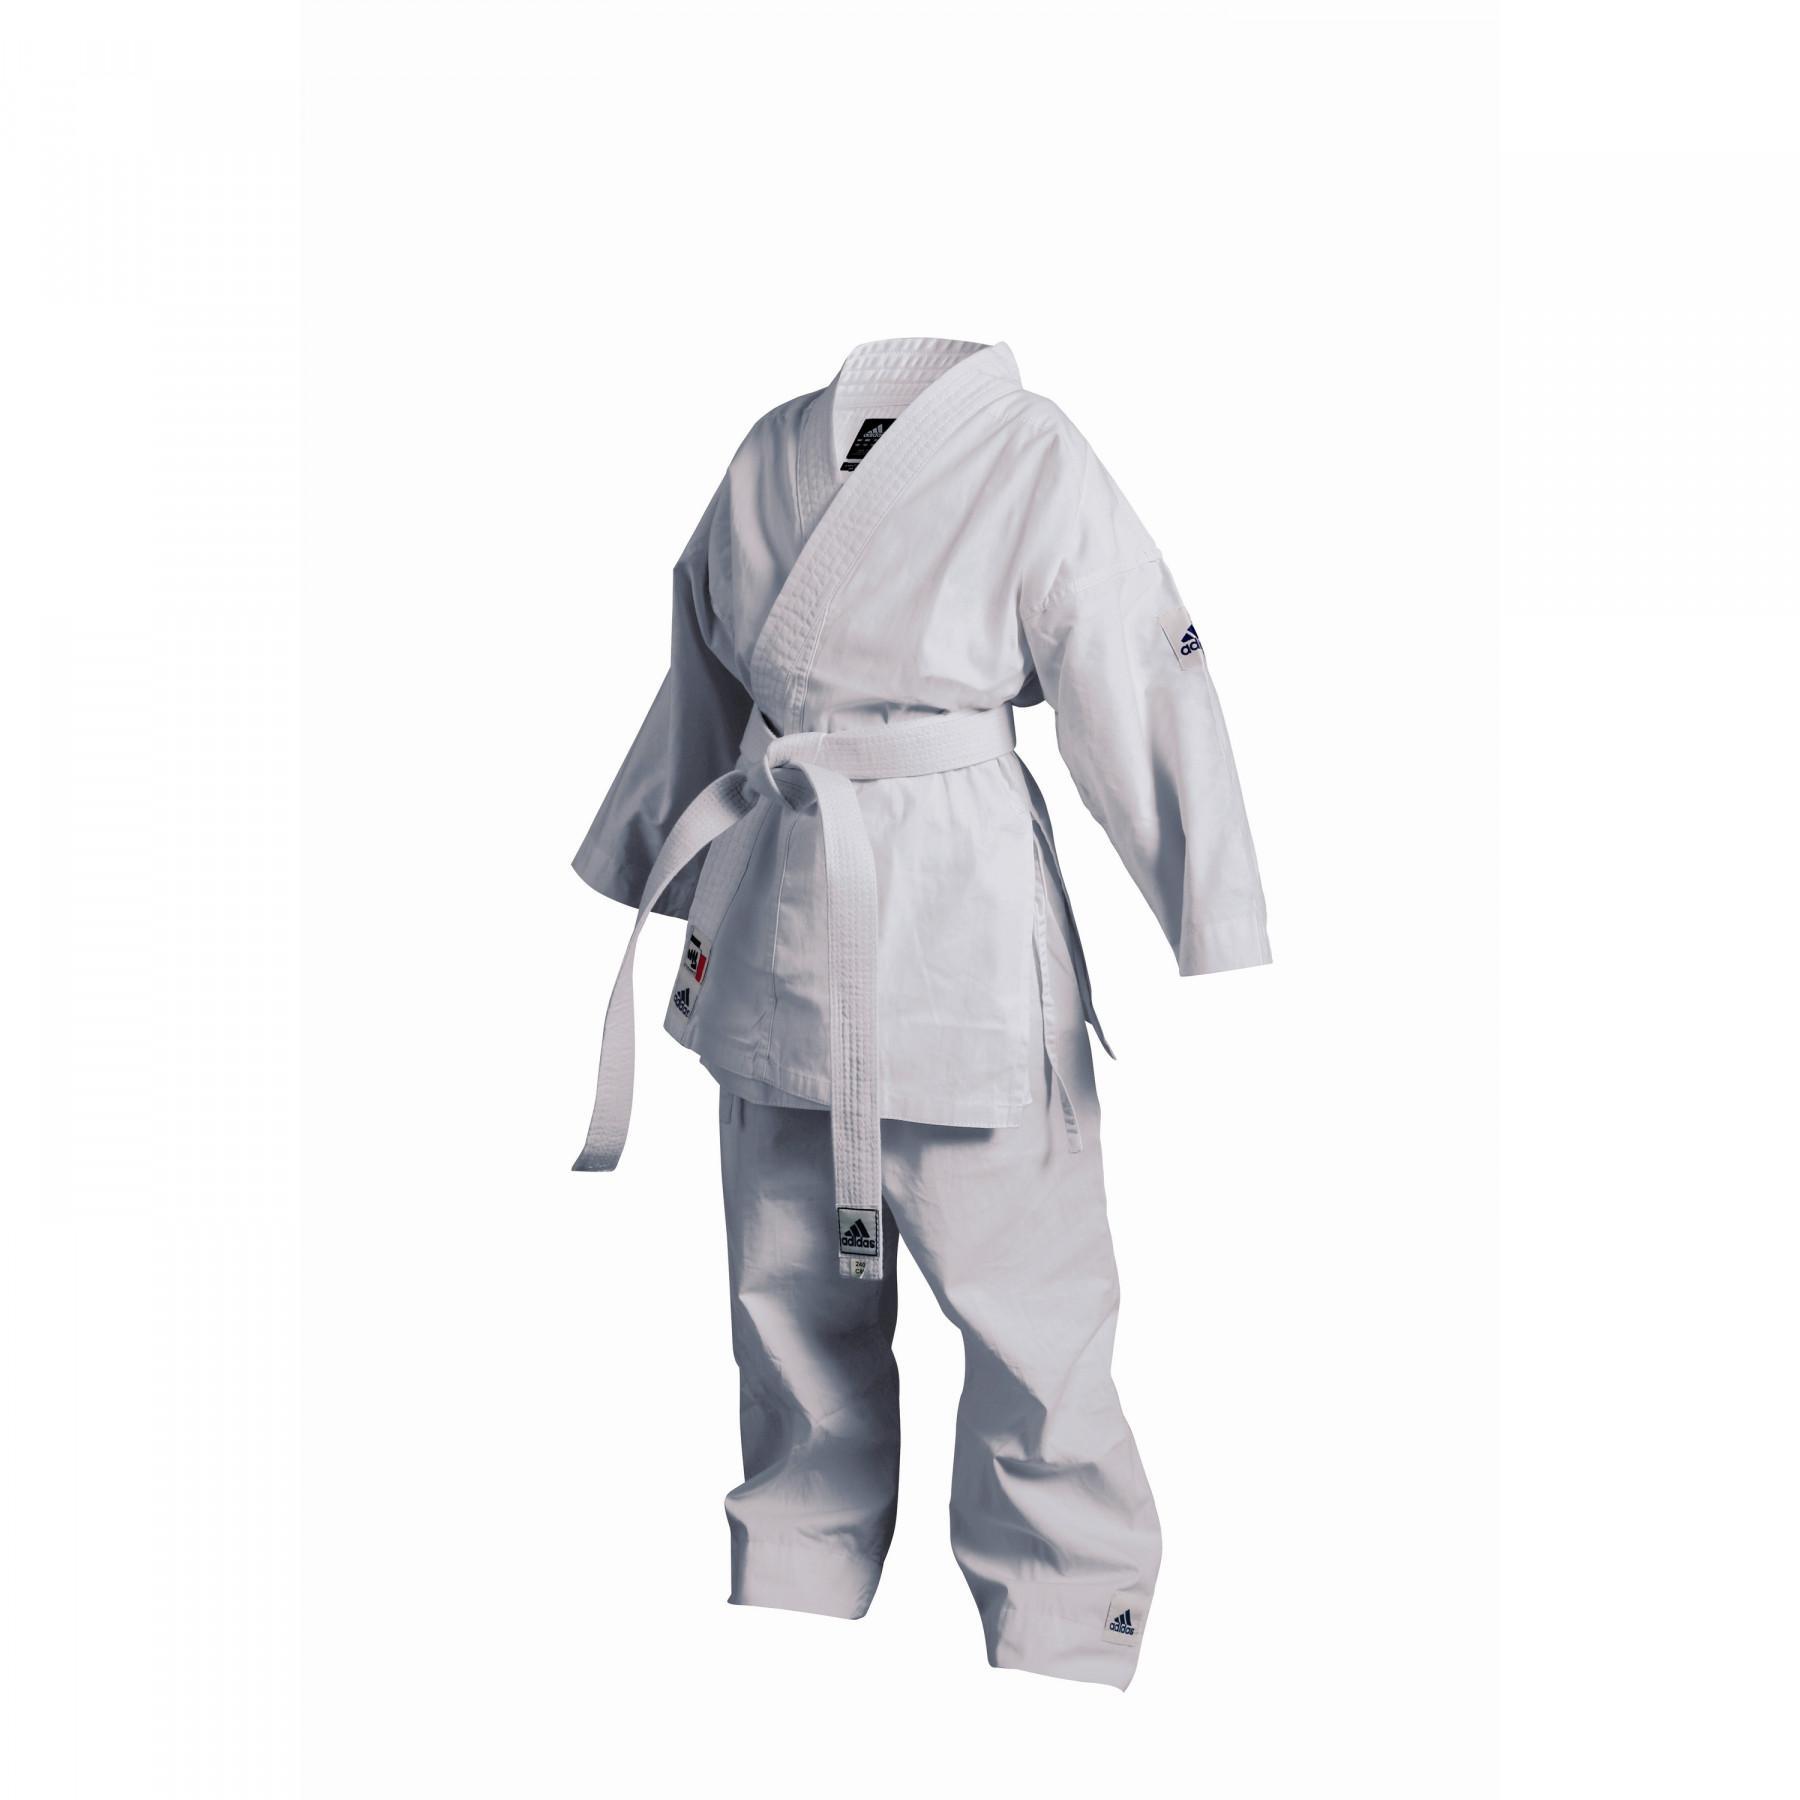 Kimono karate evolutive child Sporti France